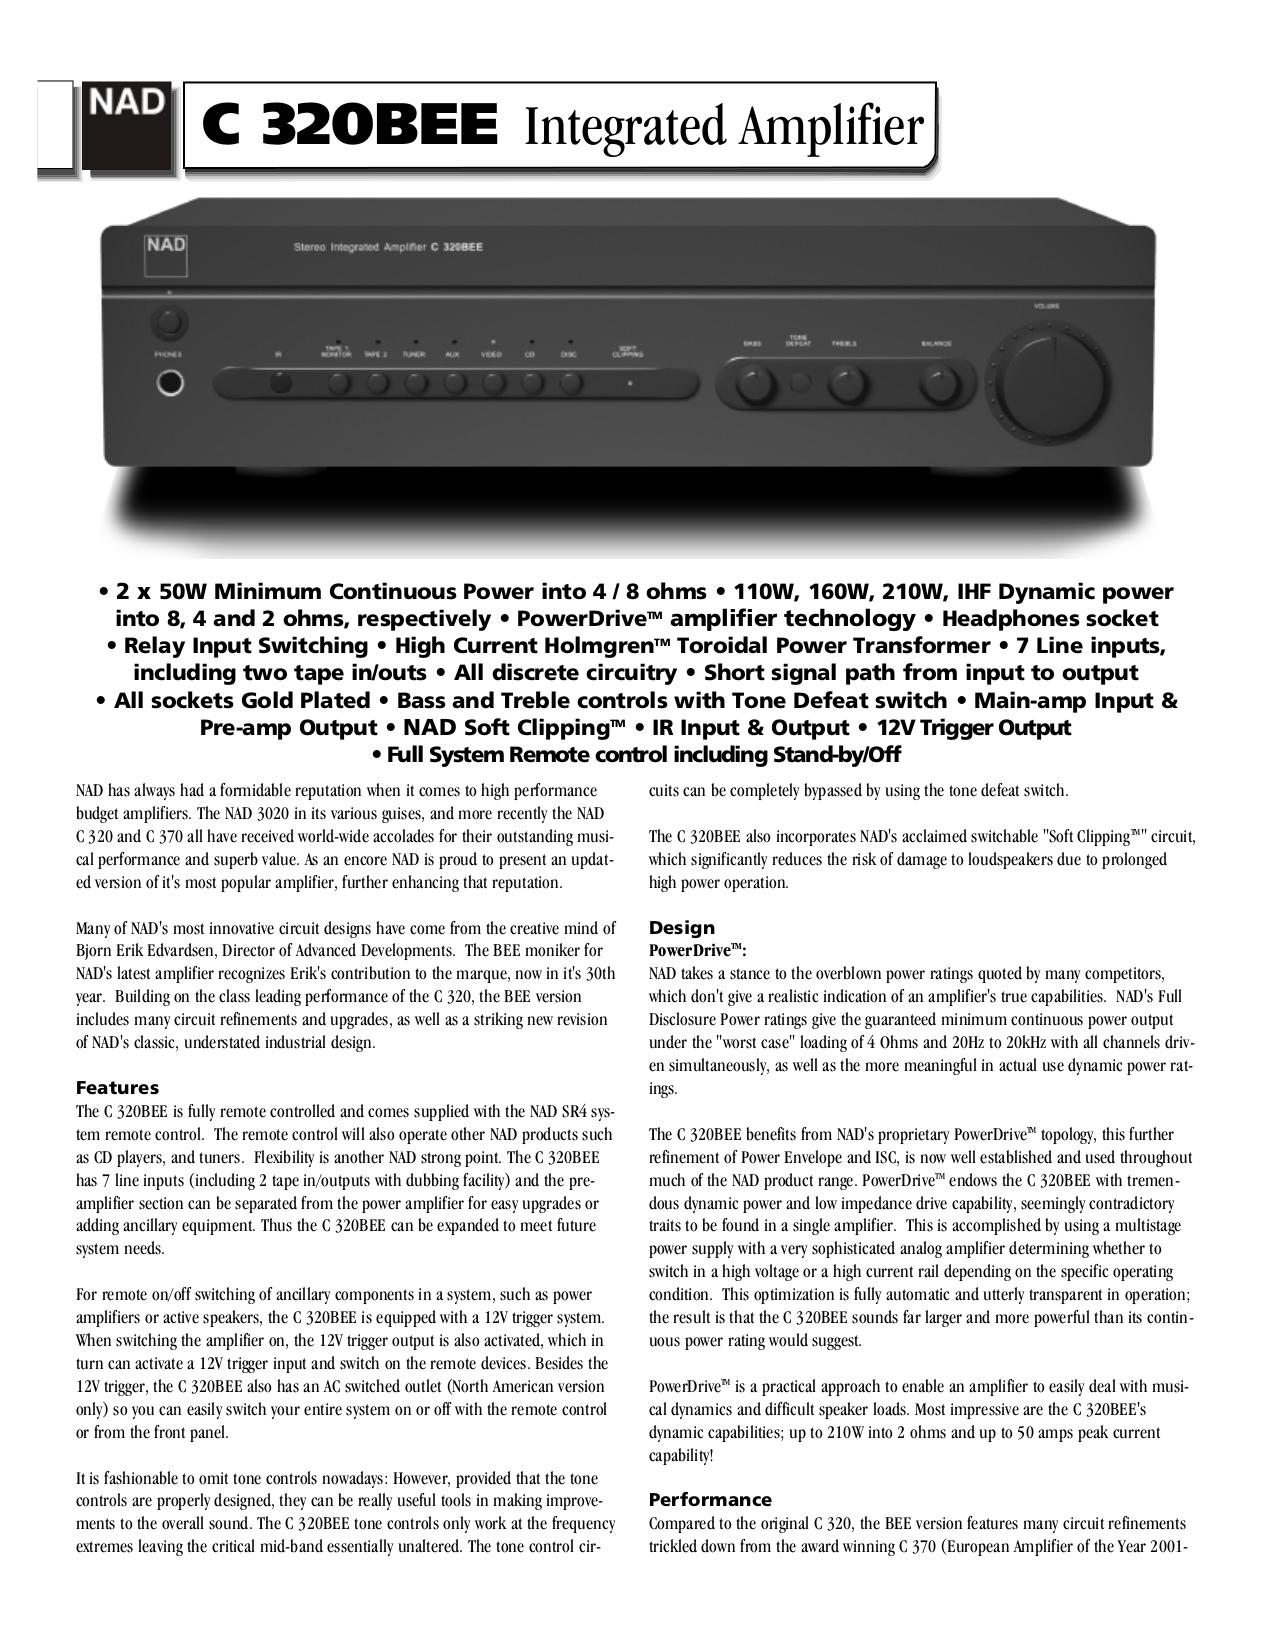 download free pdf for nad c320bee amp manual rh umlib com nad c320bee service manual nad c320bee review what hifi